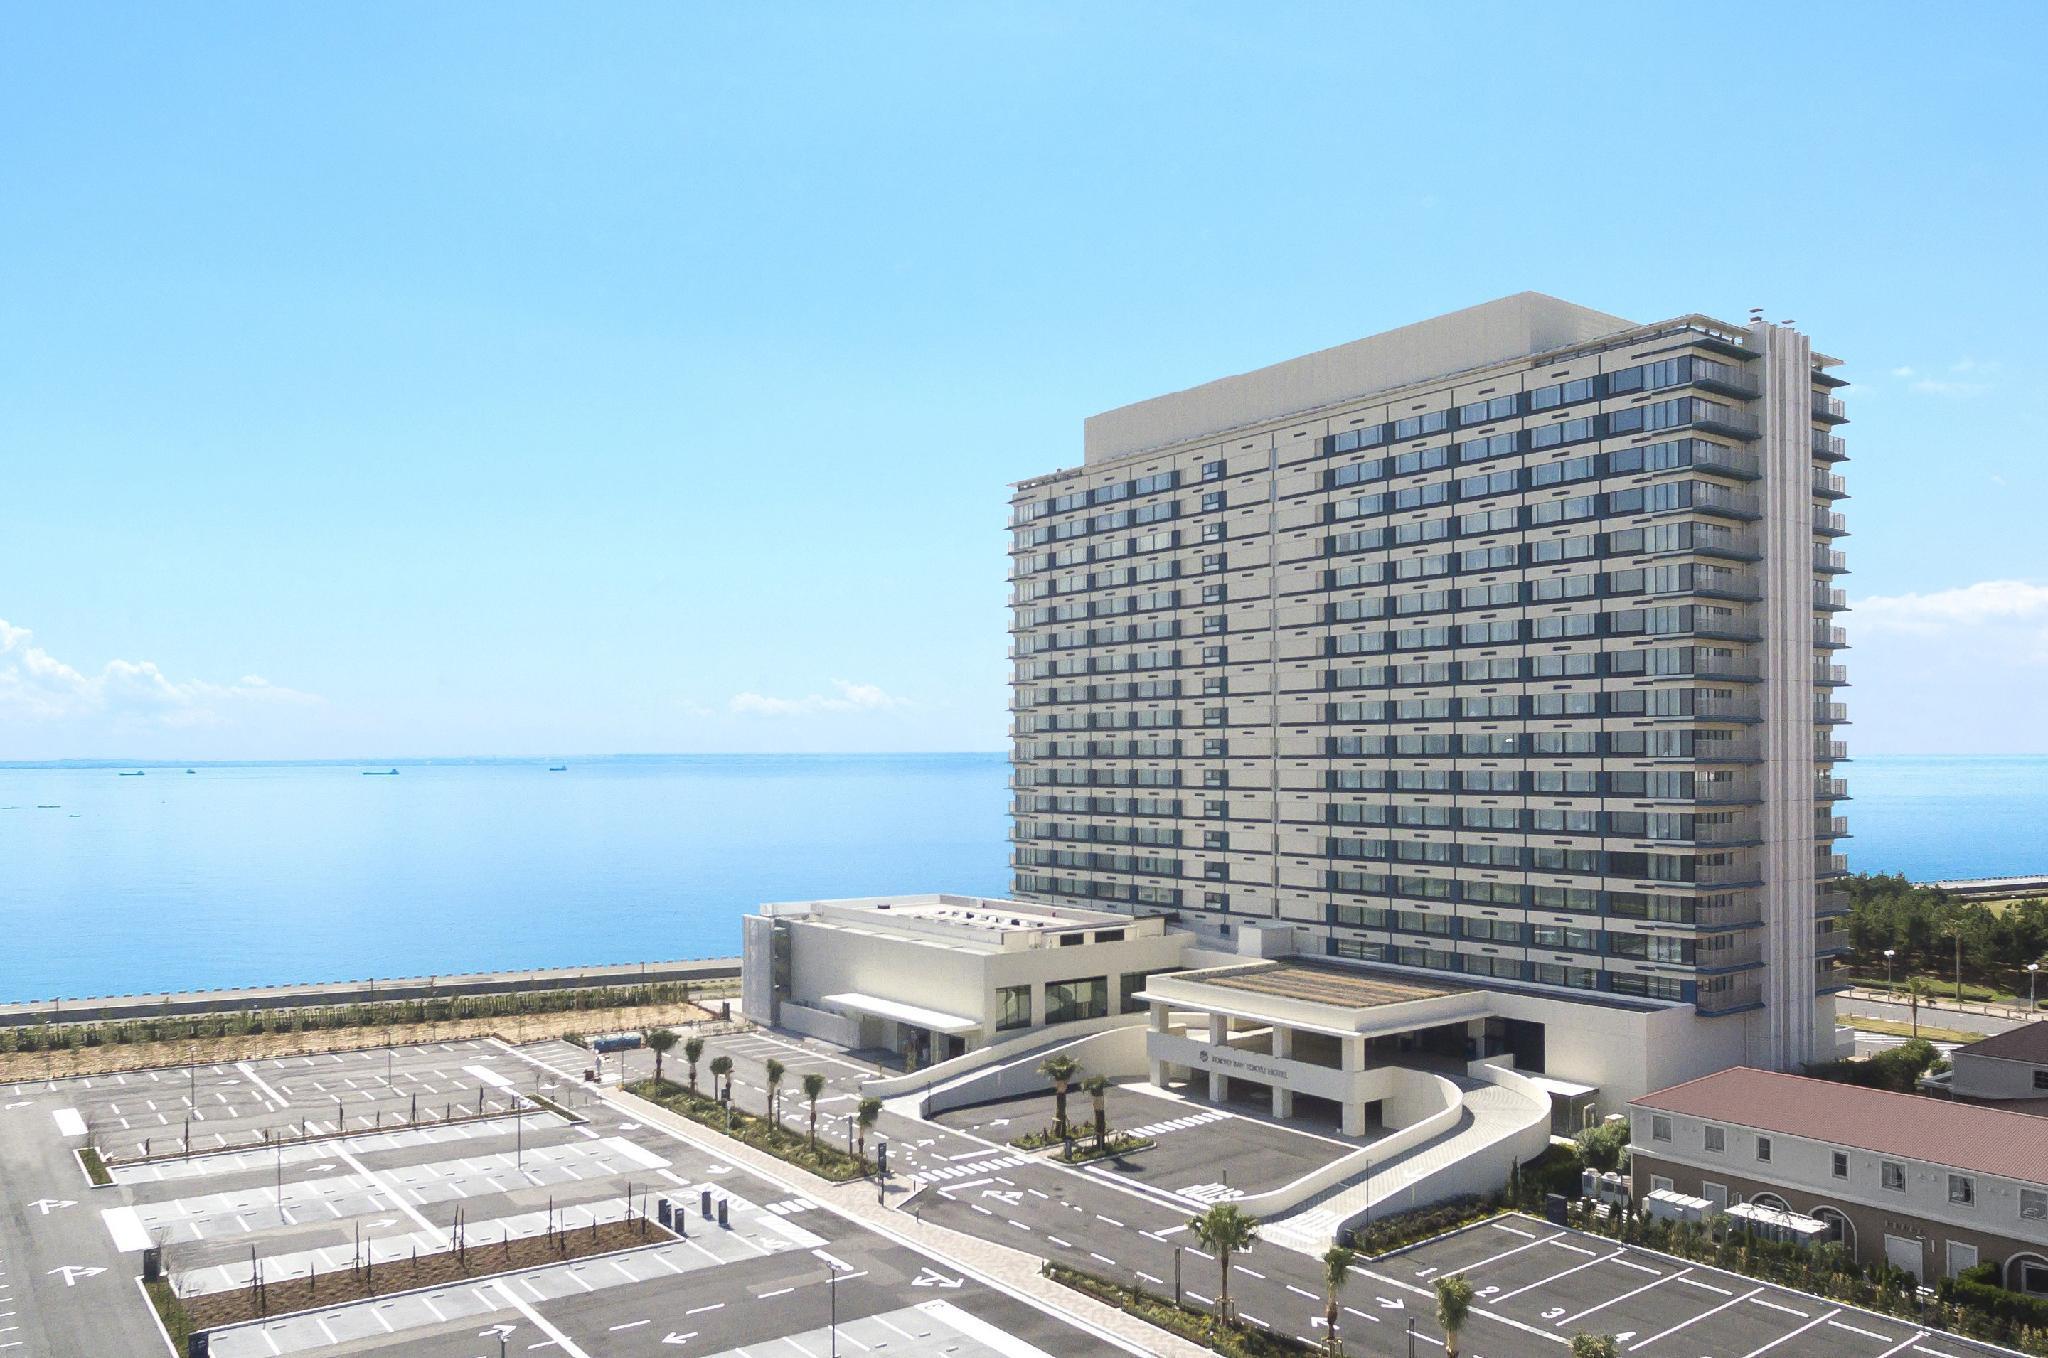 東京灣東急酒店 Tokyo Bay Tokyu Hotel